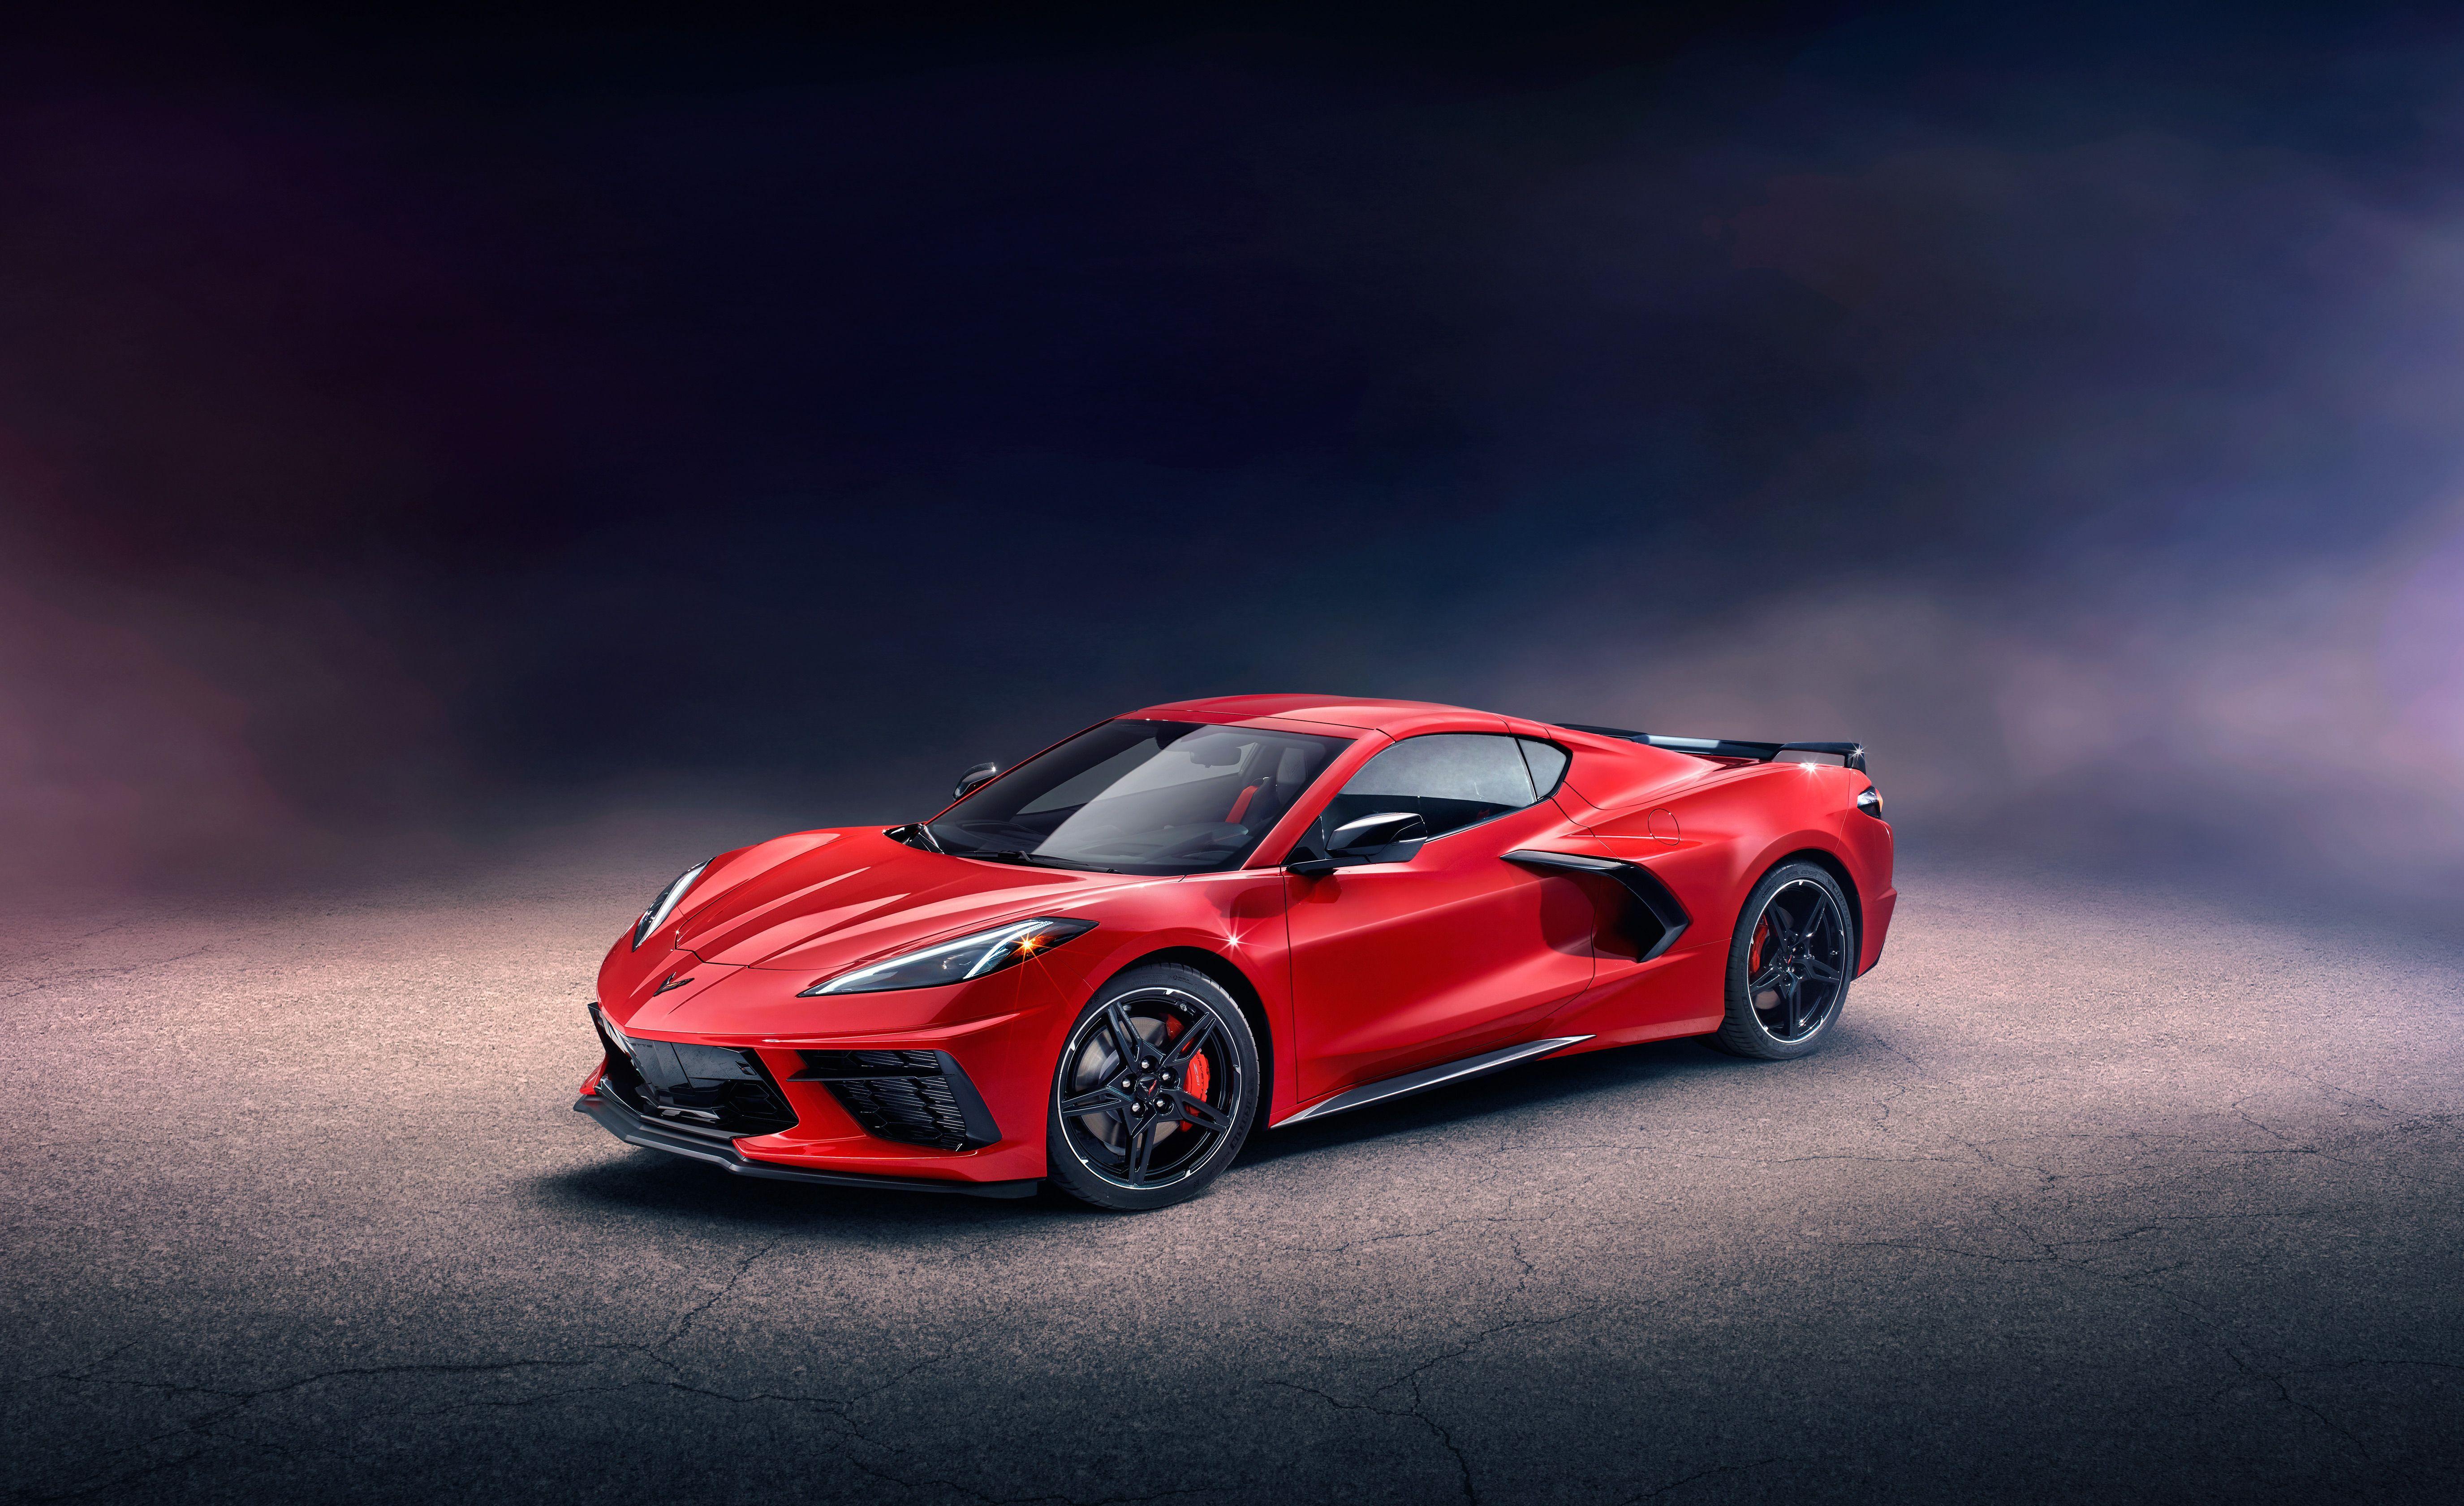 The Brand New 2020 C8 Corvette The Unlimited Driver